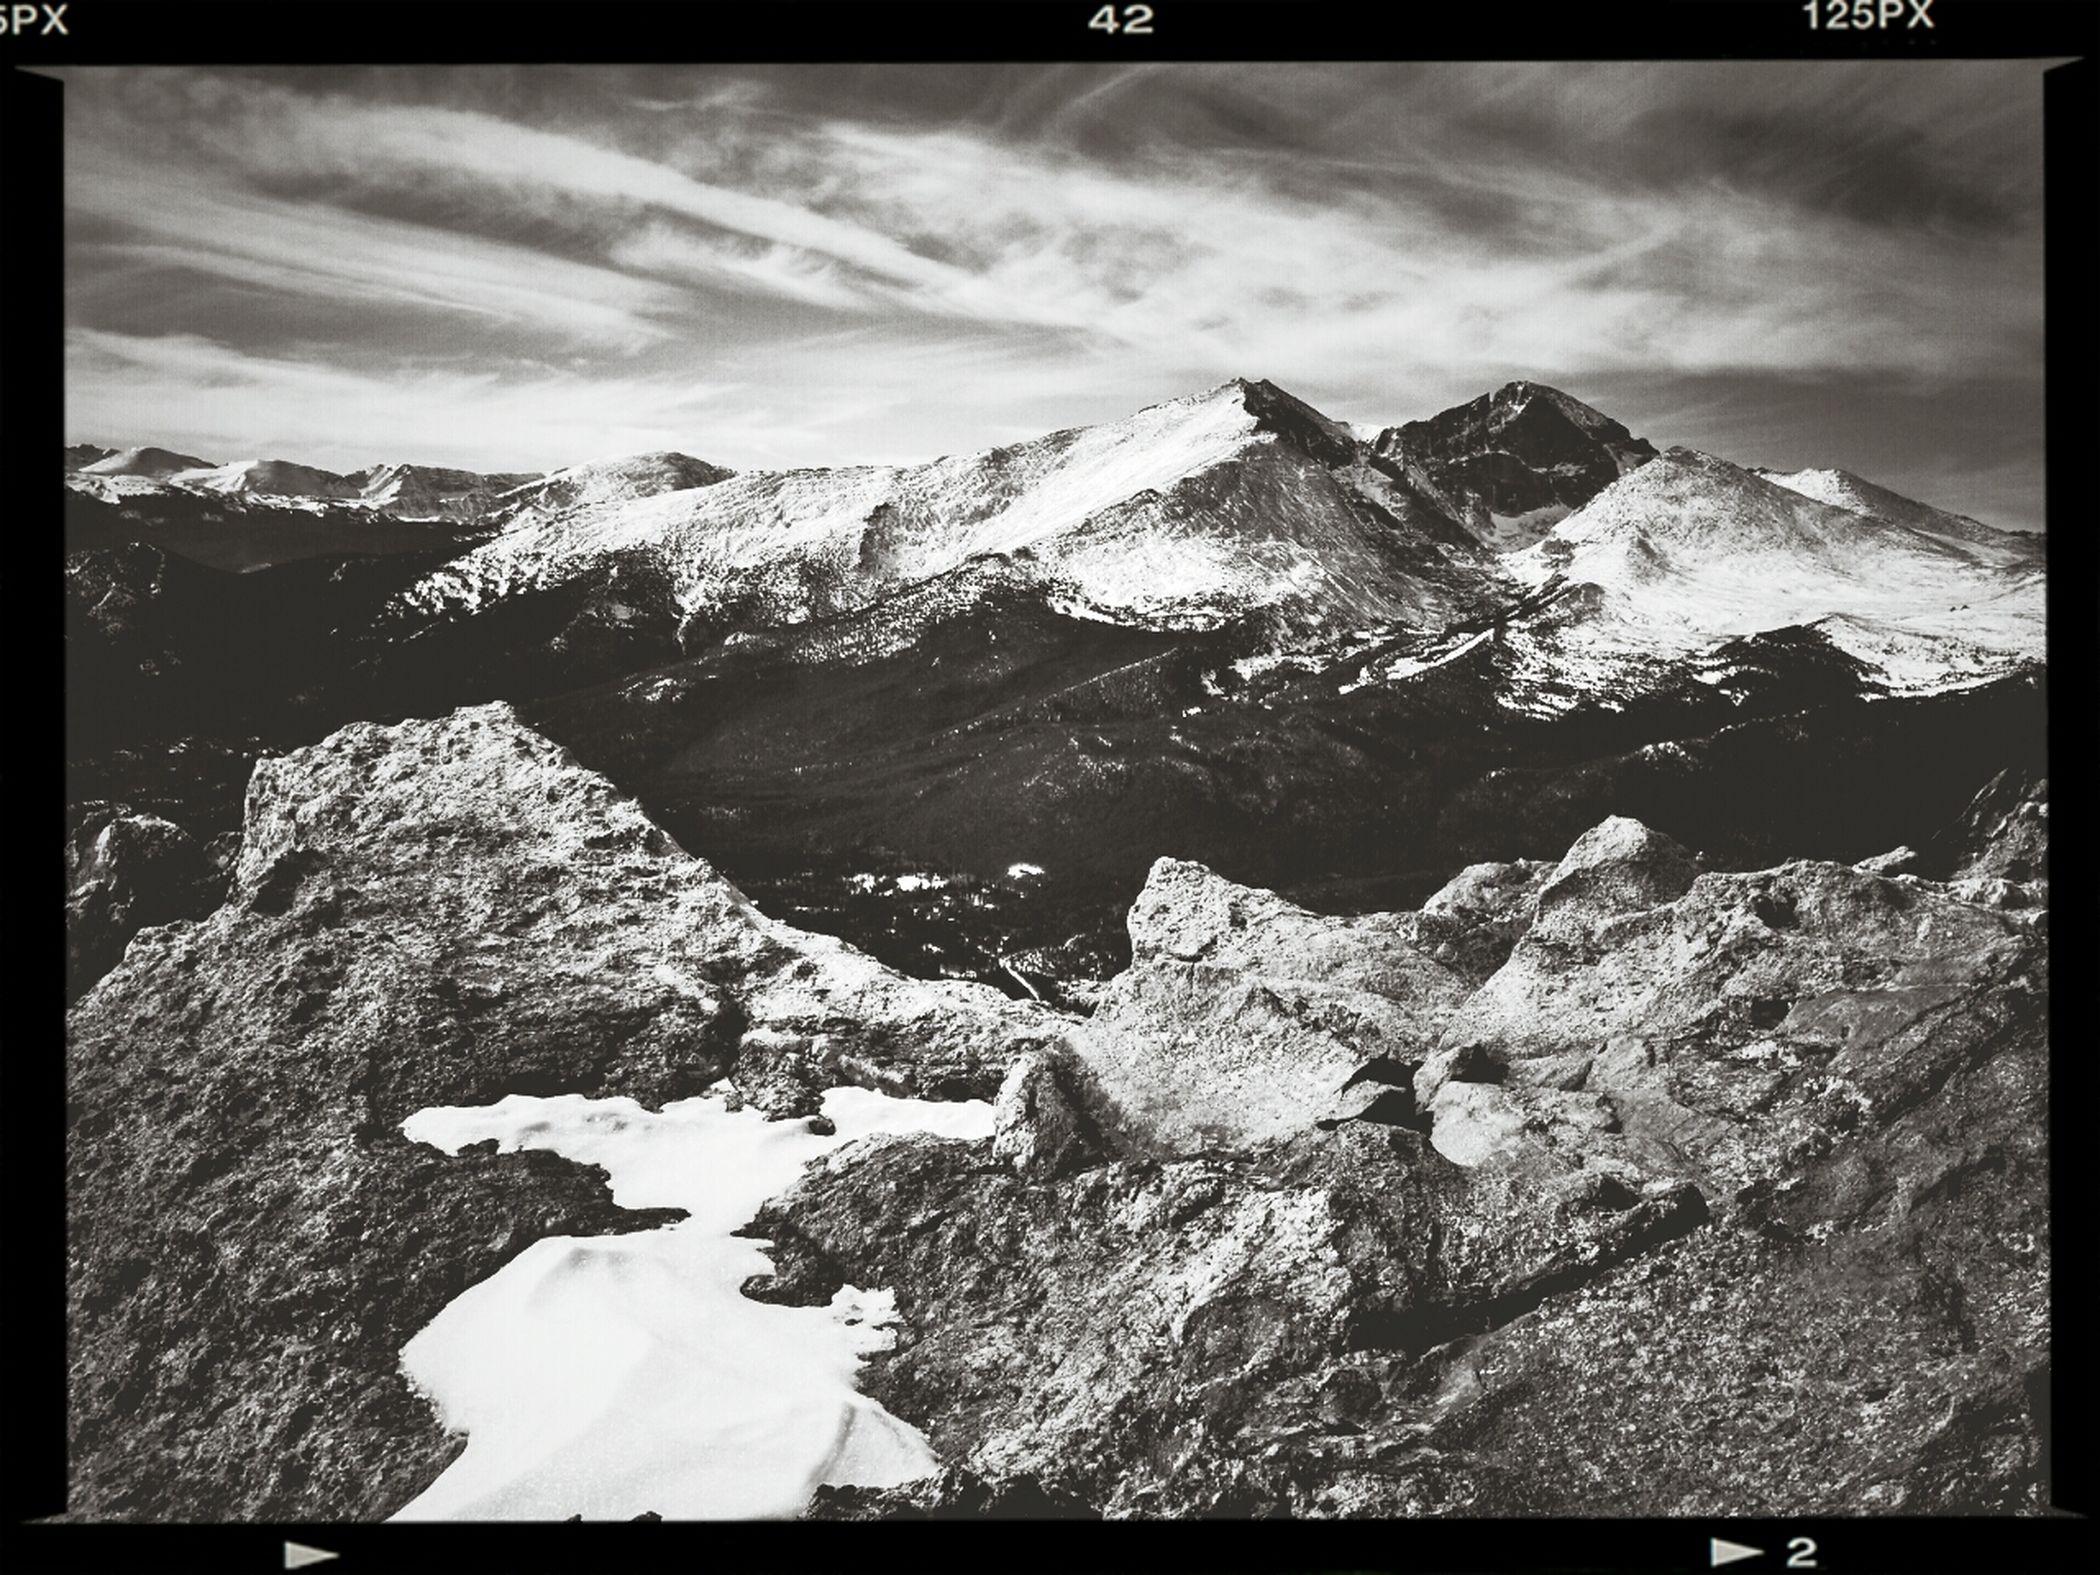 Longs Peak Rocky Mountain National Park Capa Filter